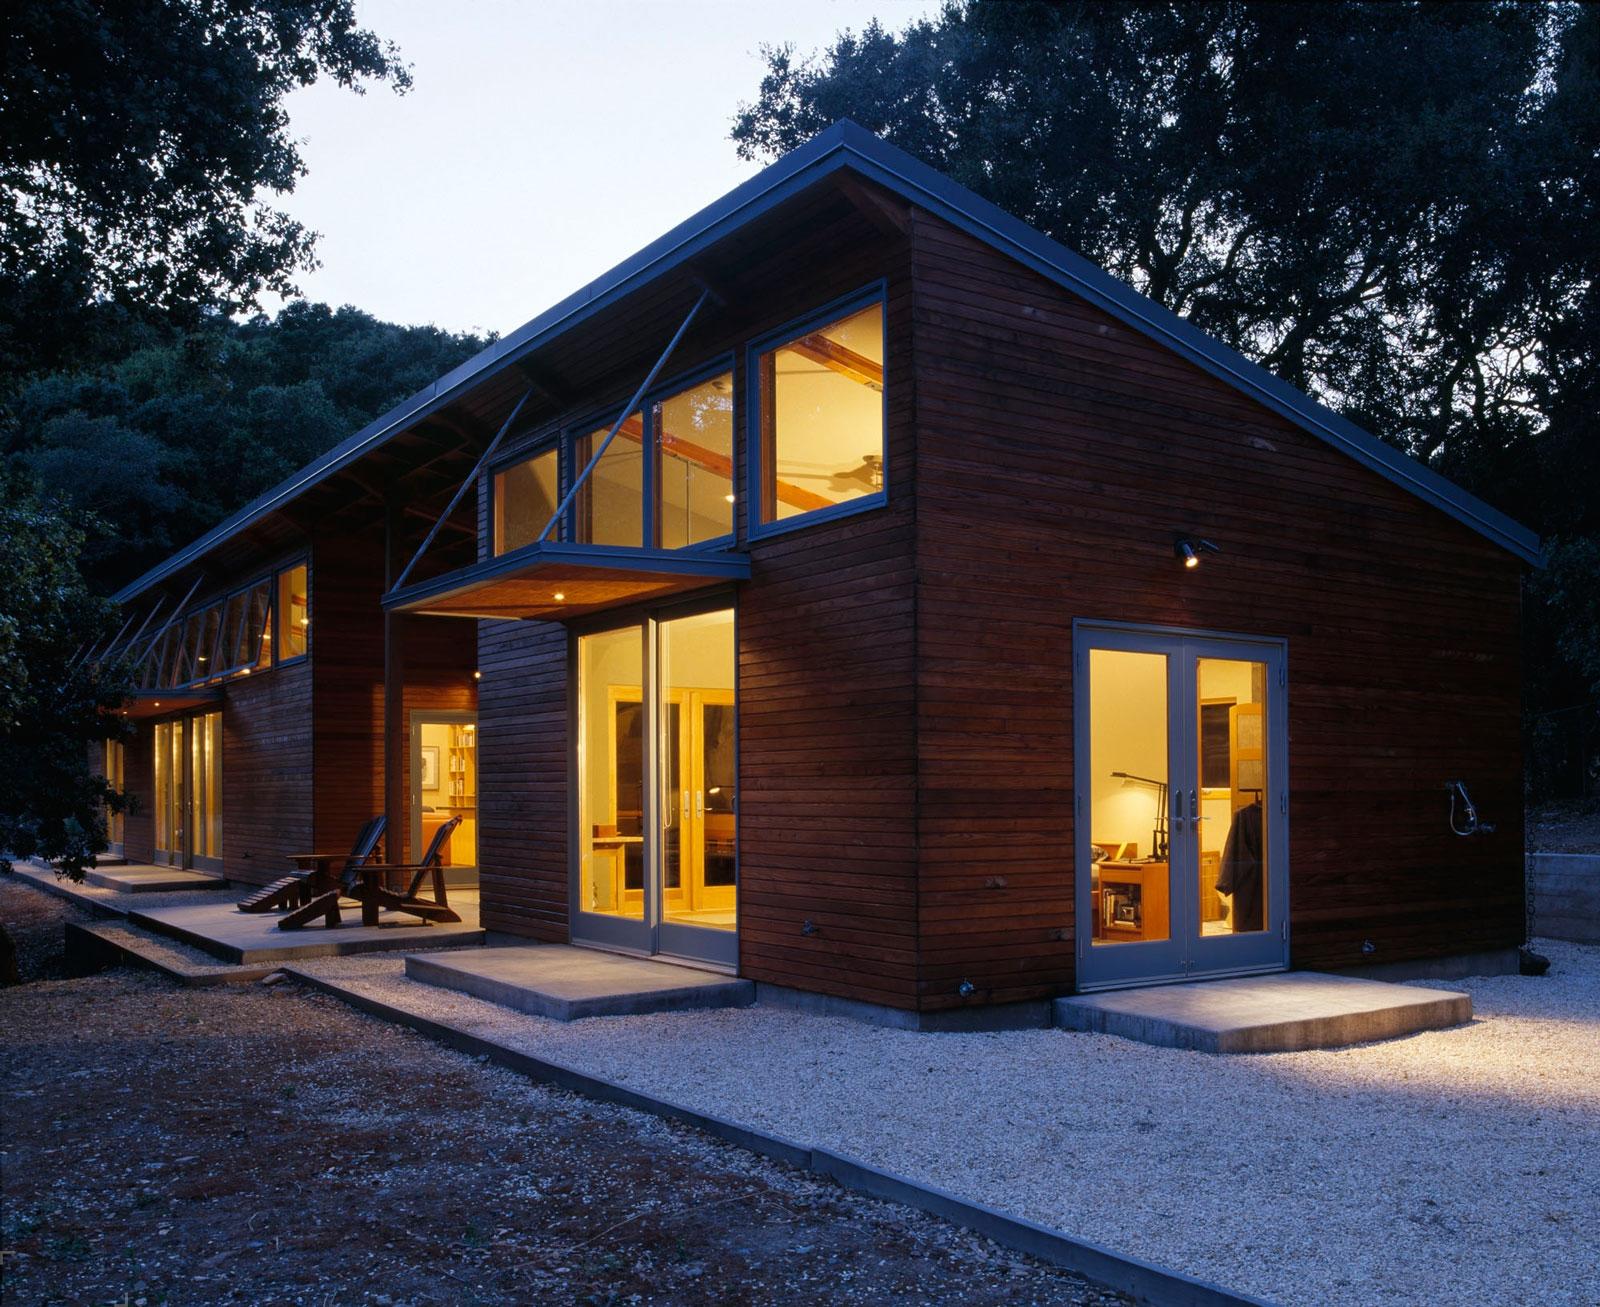 Проект небольшого домика от студии Klopf Architecture